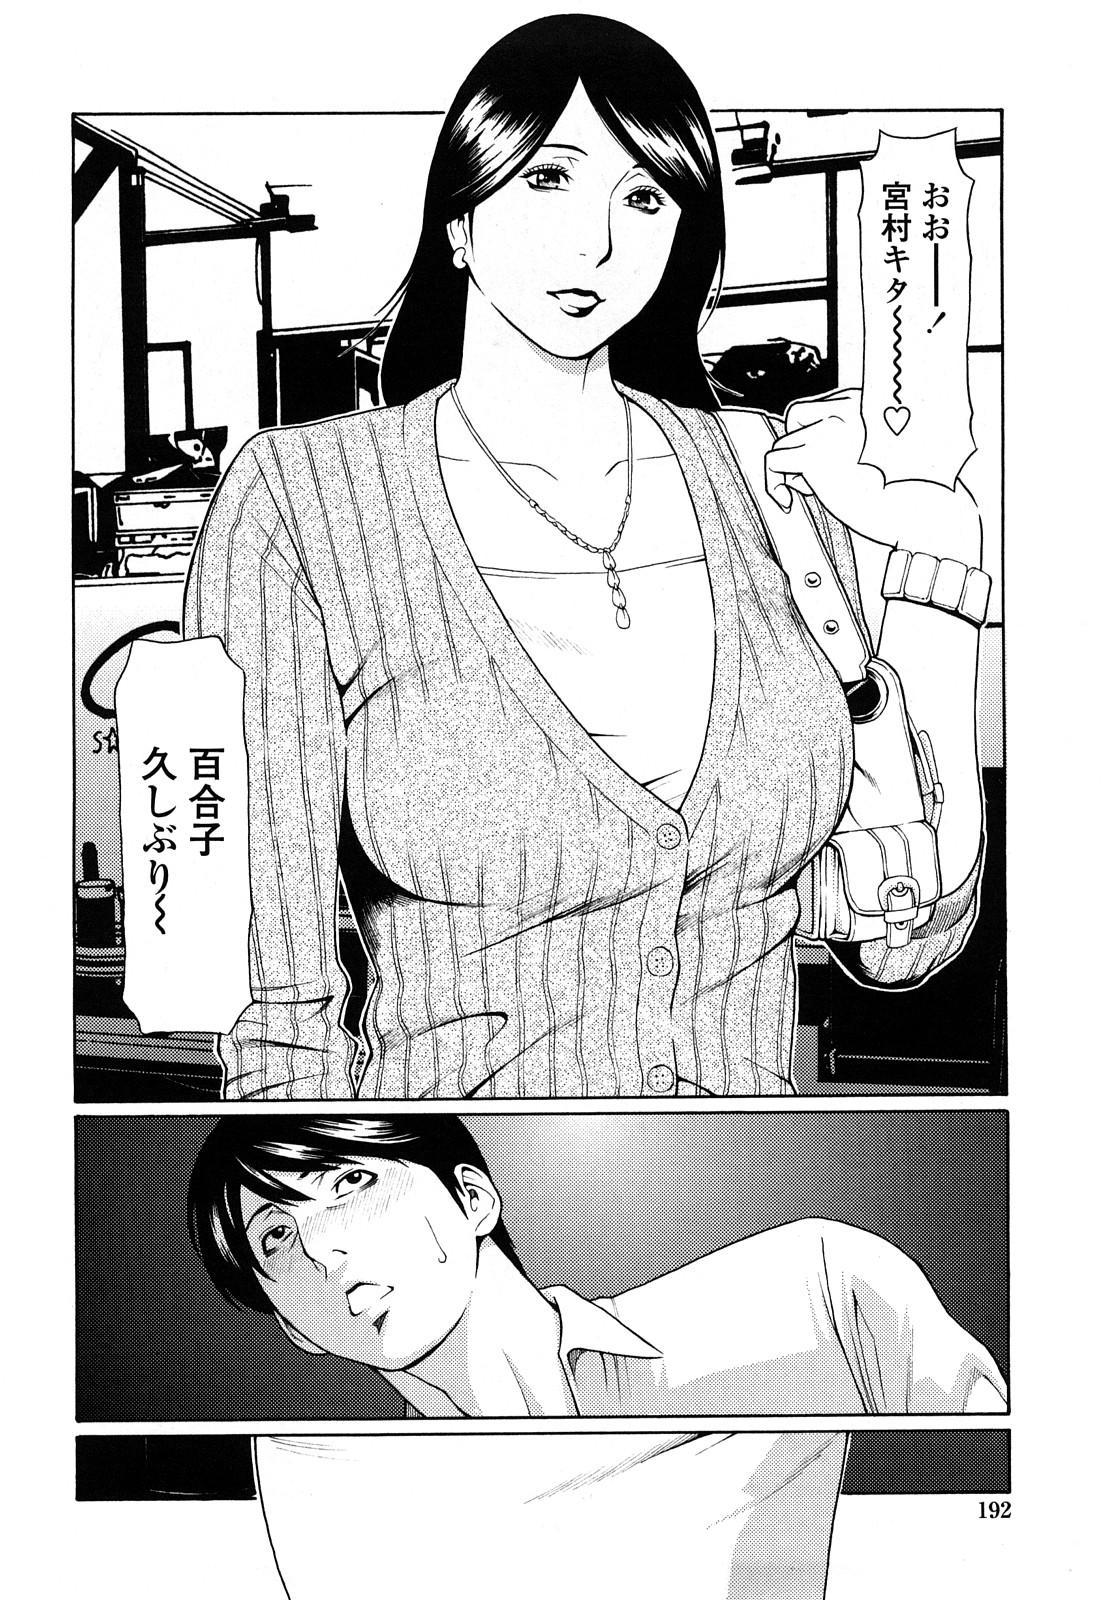 [Takasugi Kou] Kindan no Haha-Ana - Immorality Love-Hole [Decensored] 193